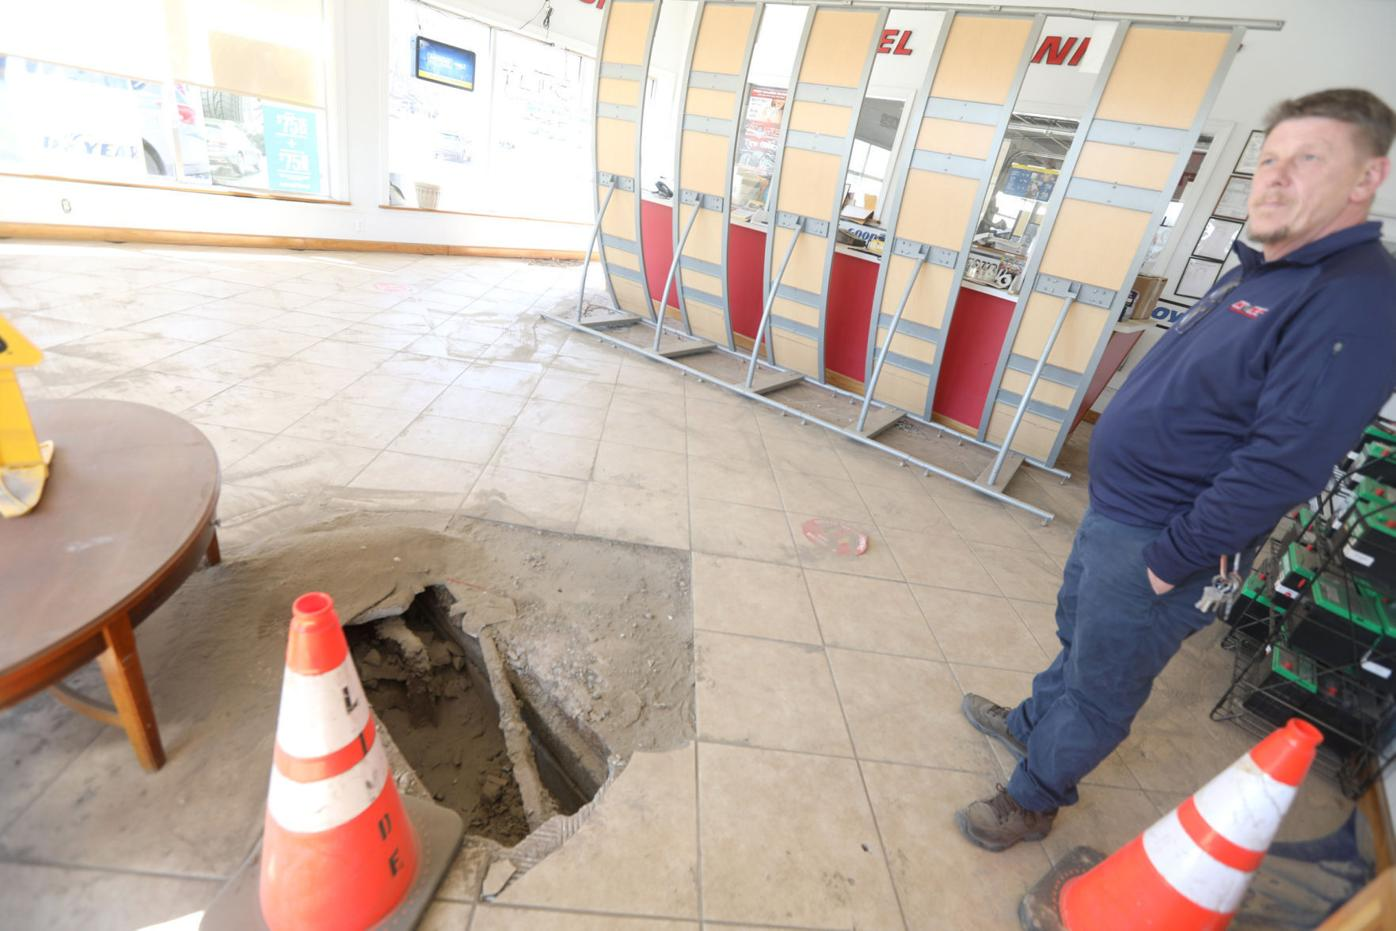 Sugarman's Plaza could have sinkholes beneath